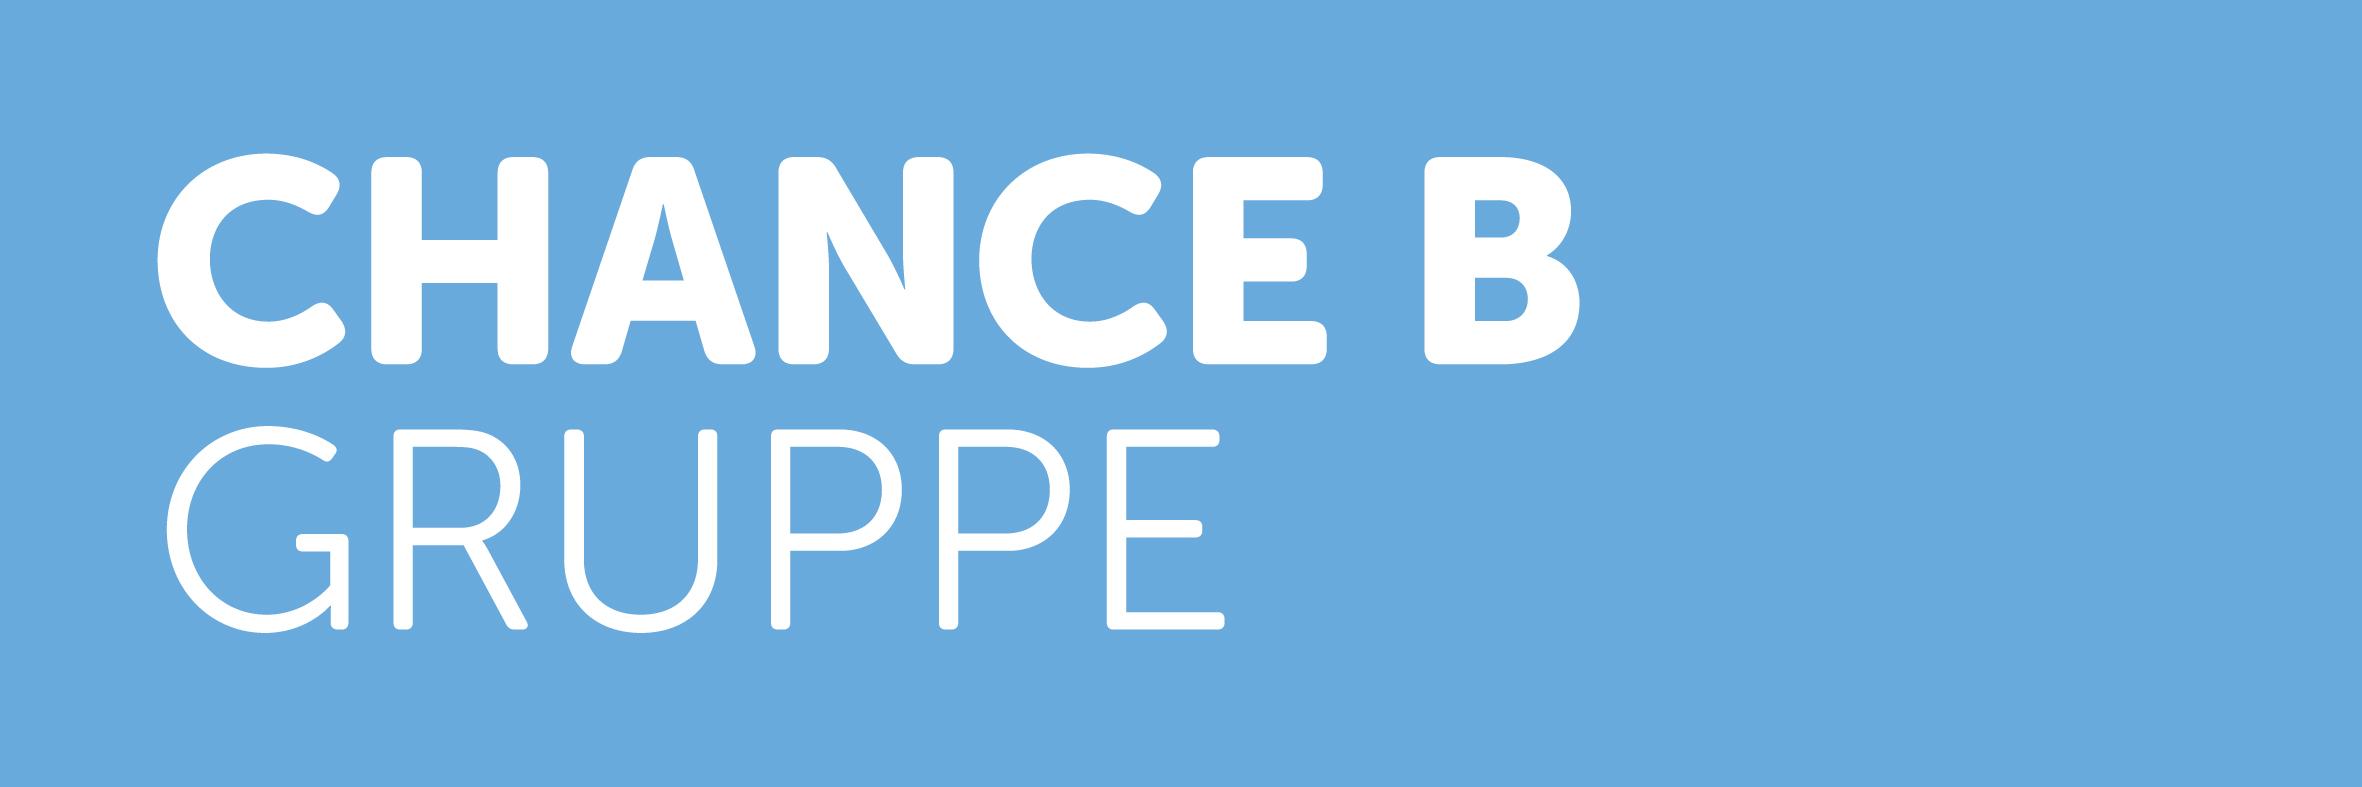 Chance B